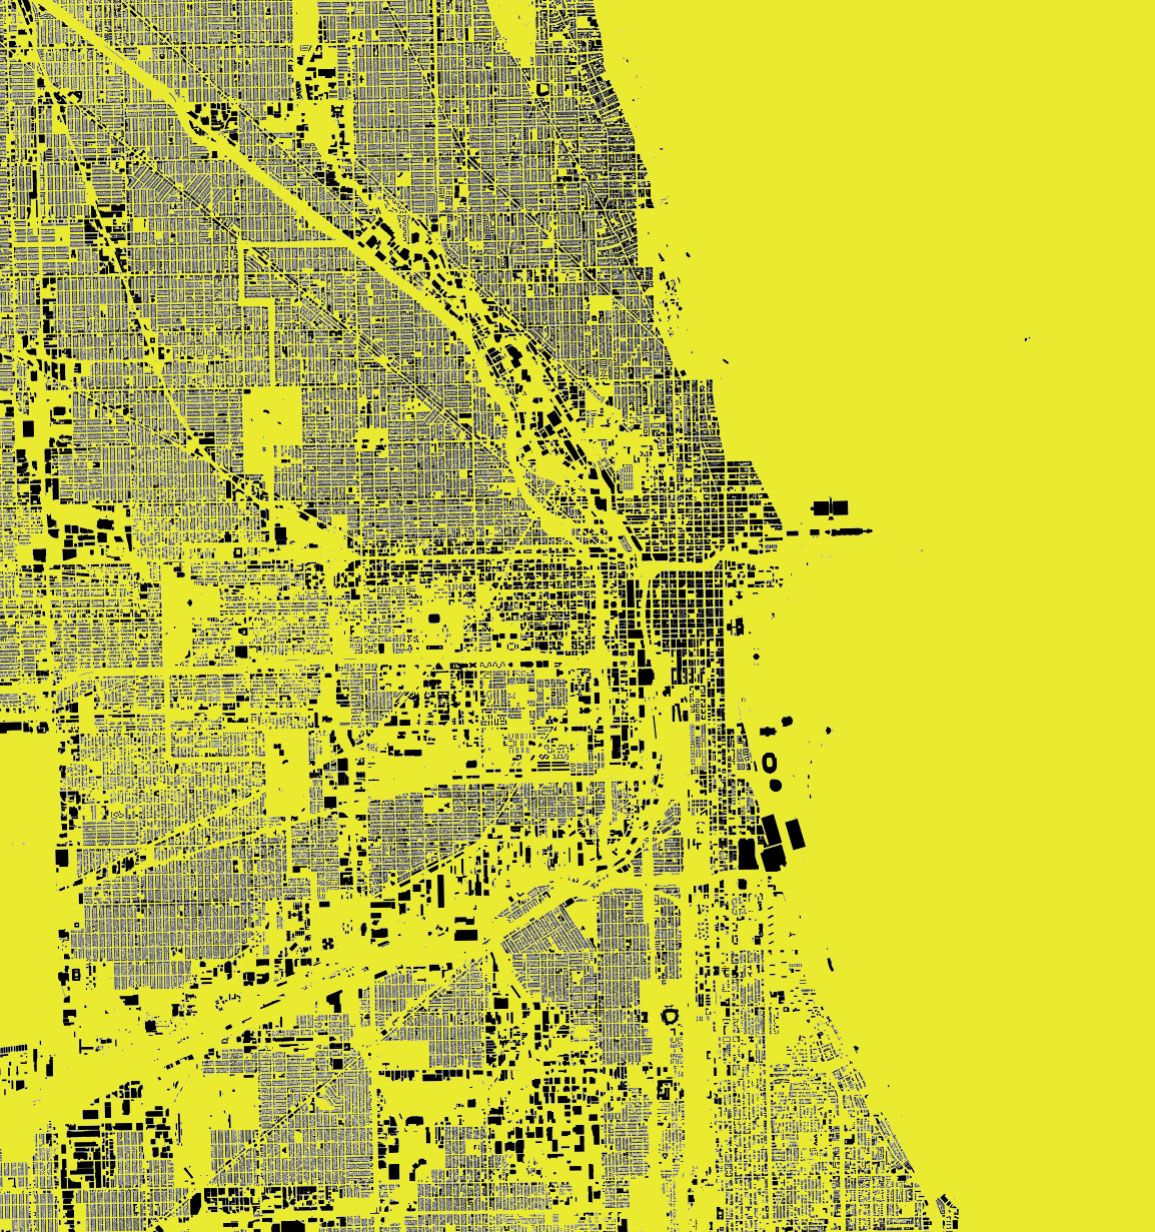 city of calgary subdivision application